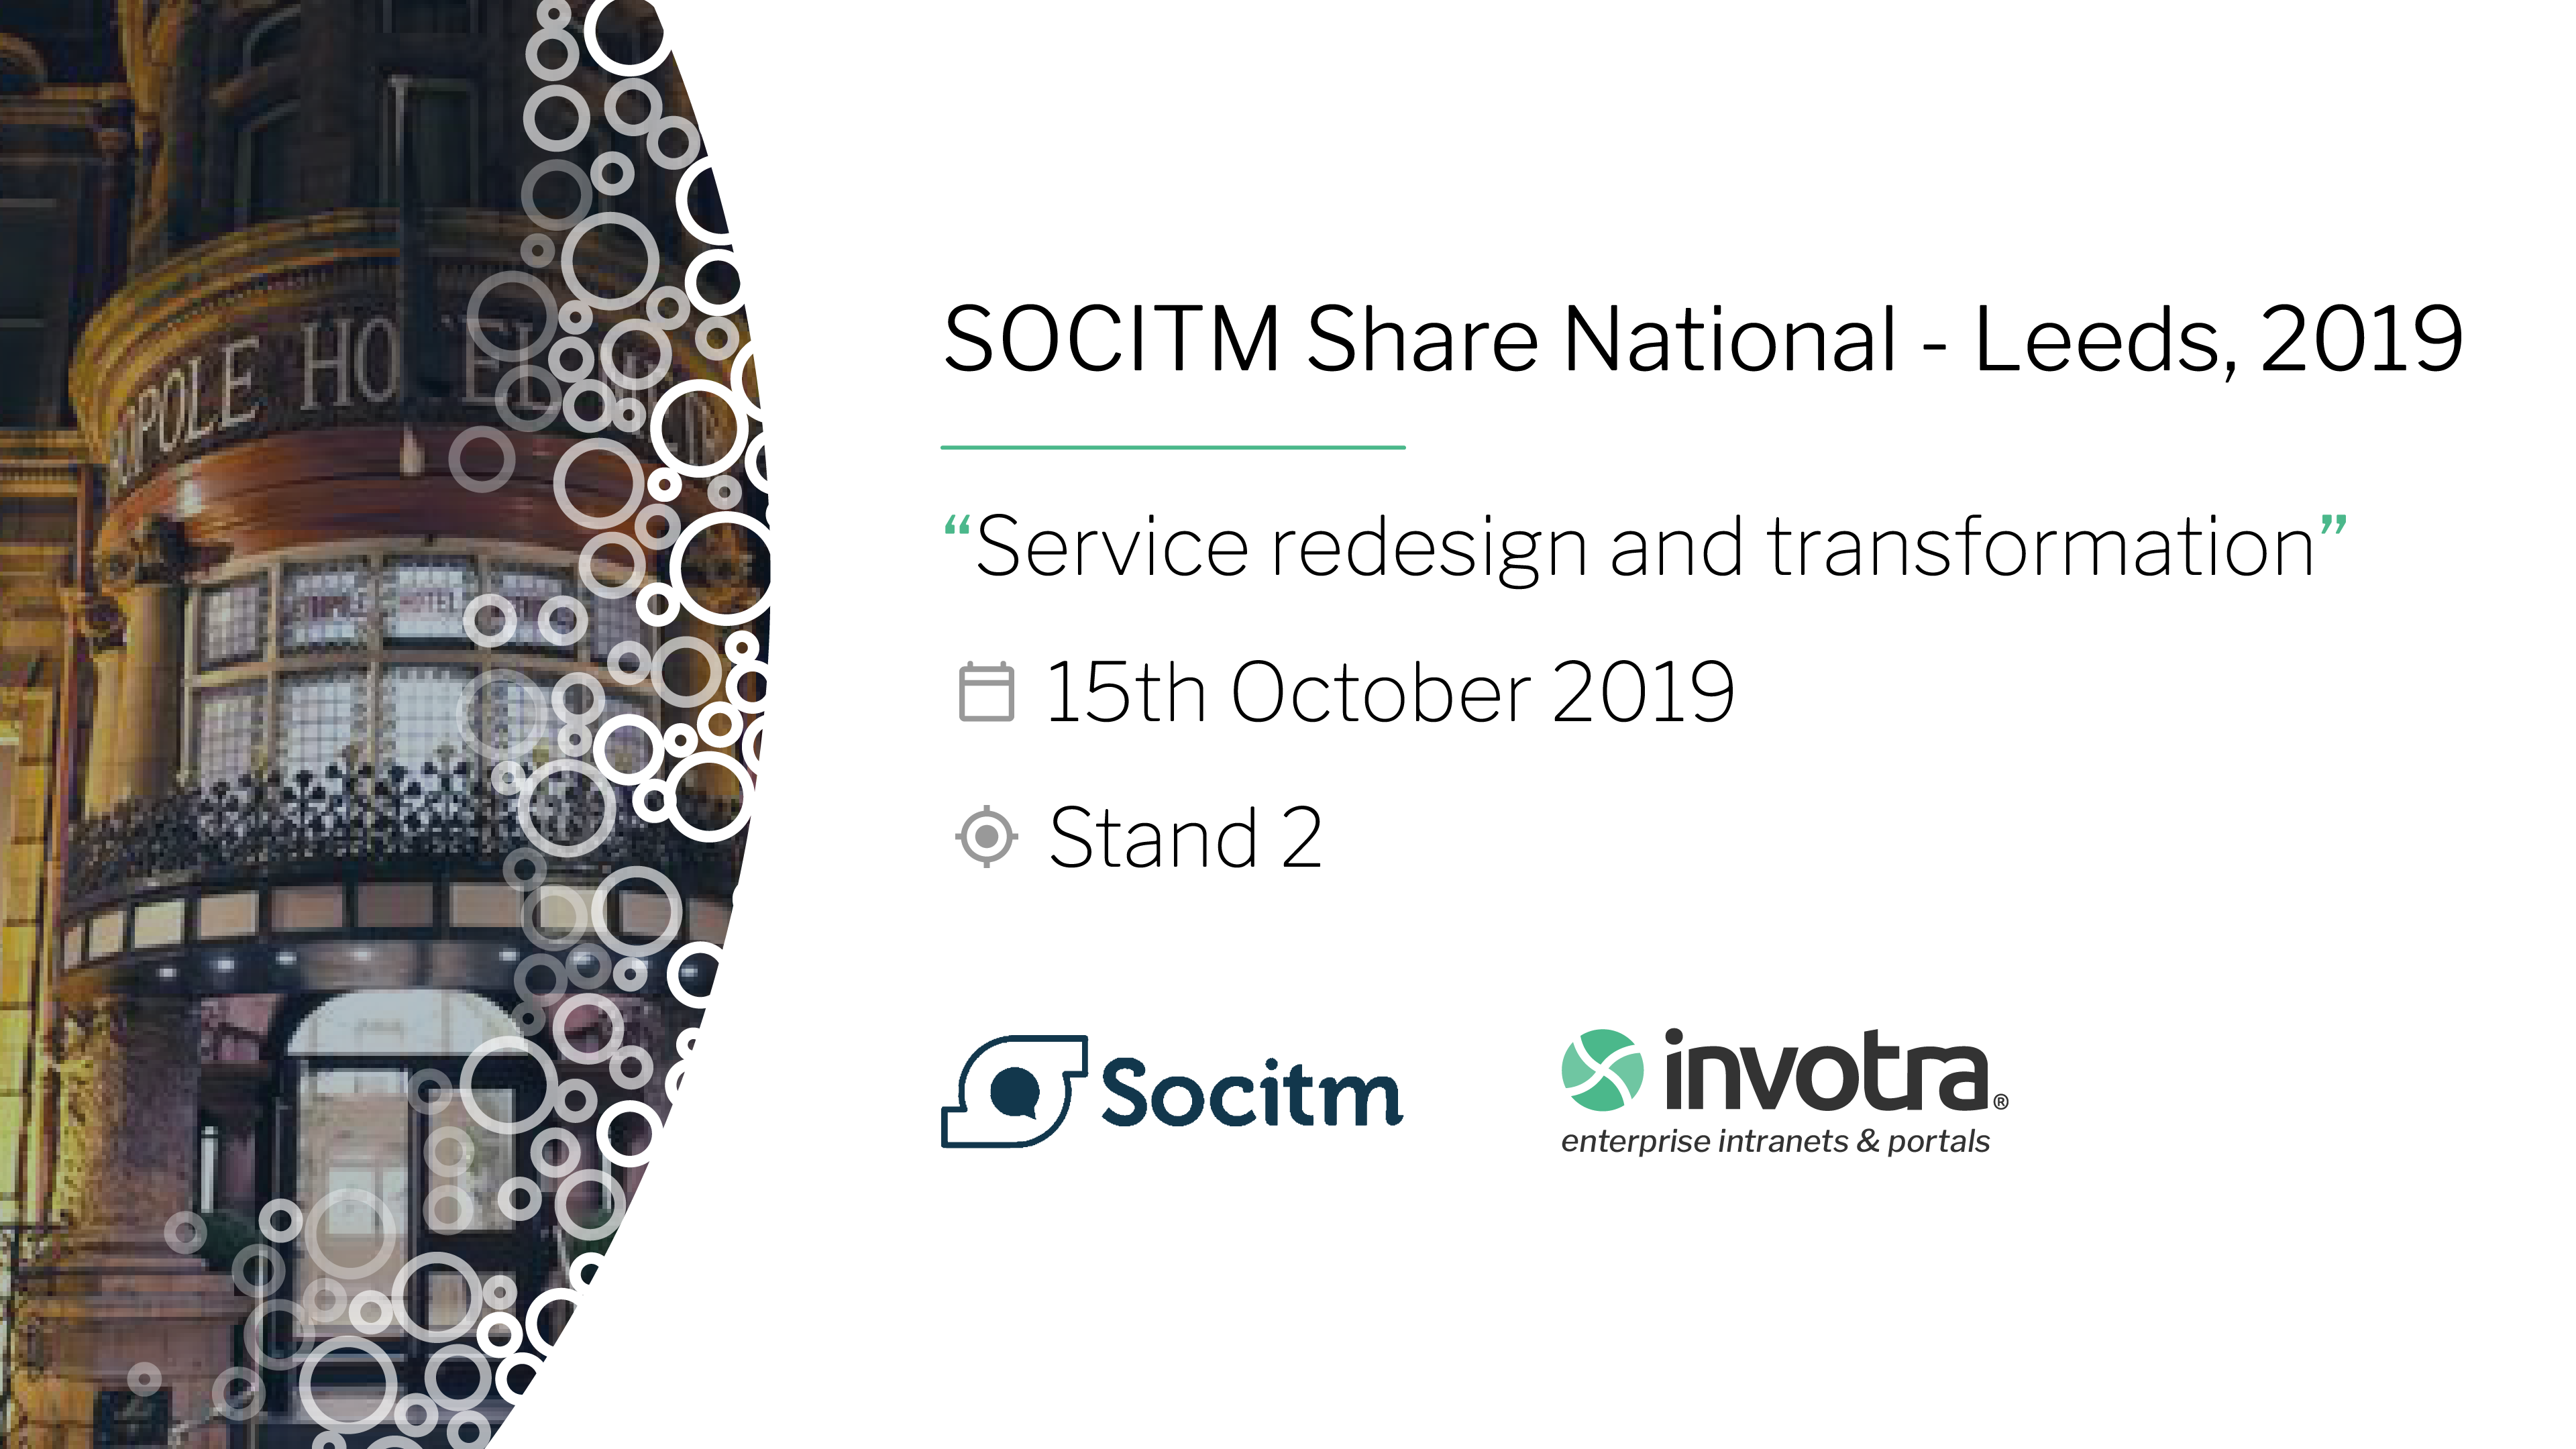 SOCITM Share National - Leeds, 2019 banner